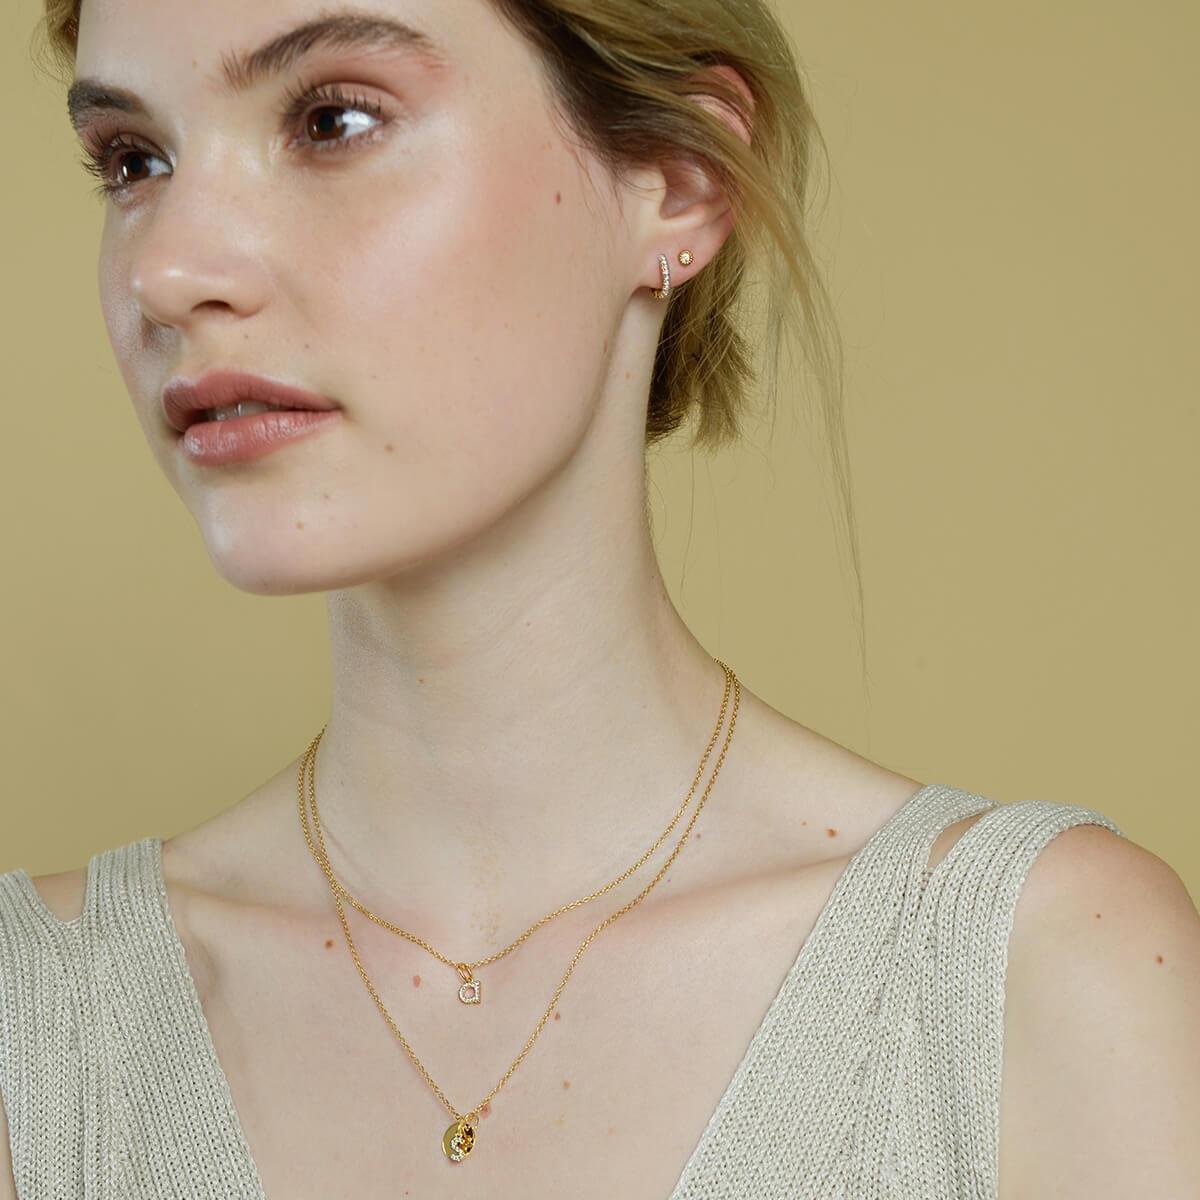 18kt Yellow Gold Vermeil Disc Charm Monogram Diamond Necklace